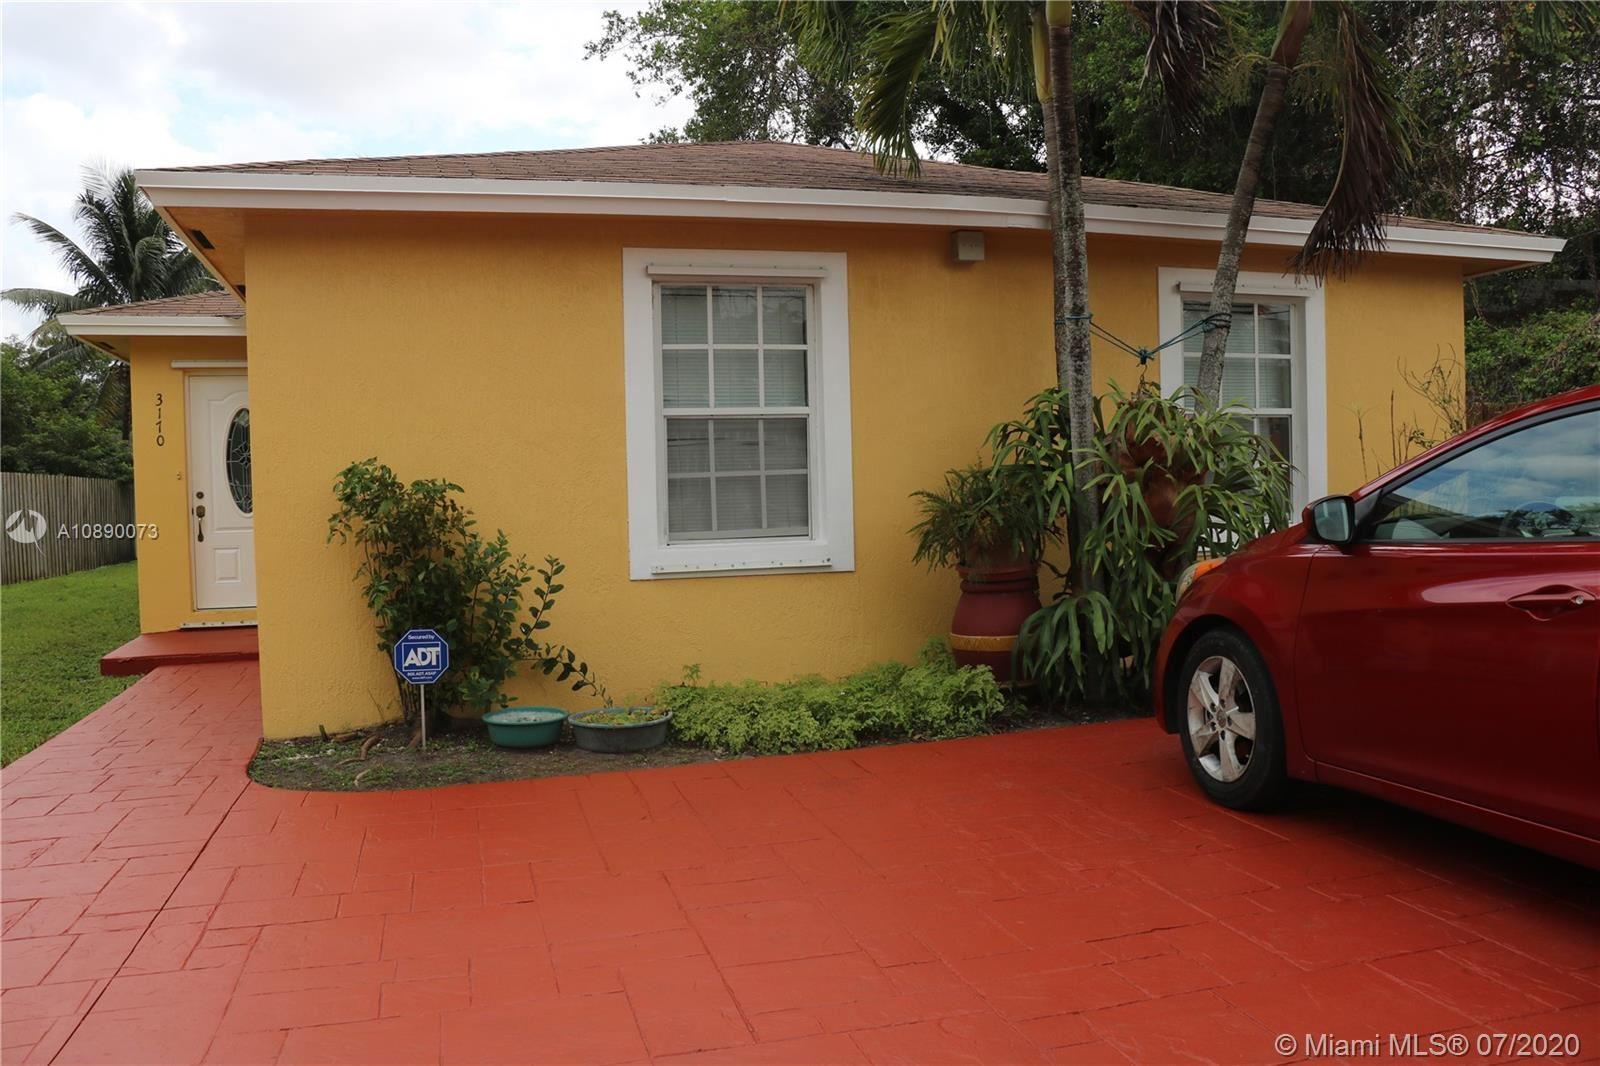 3170 NW 170th St, Miami Gardens, FL 33056 - #: A10890073